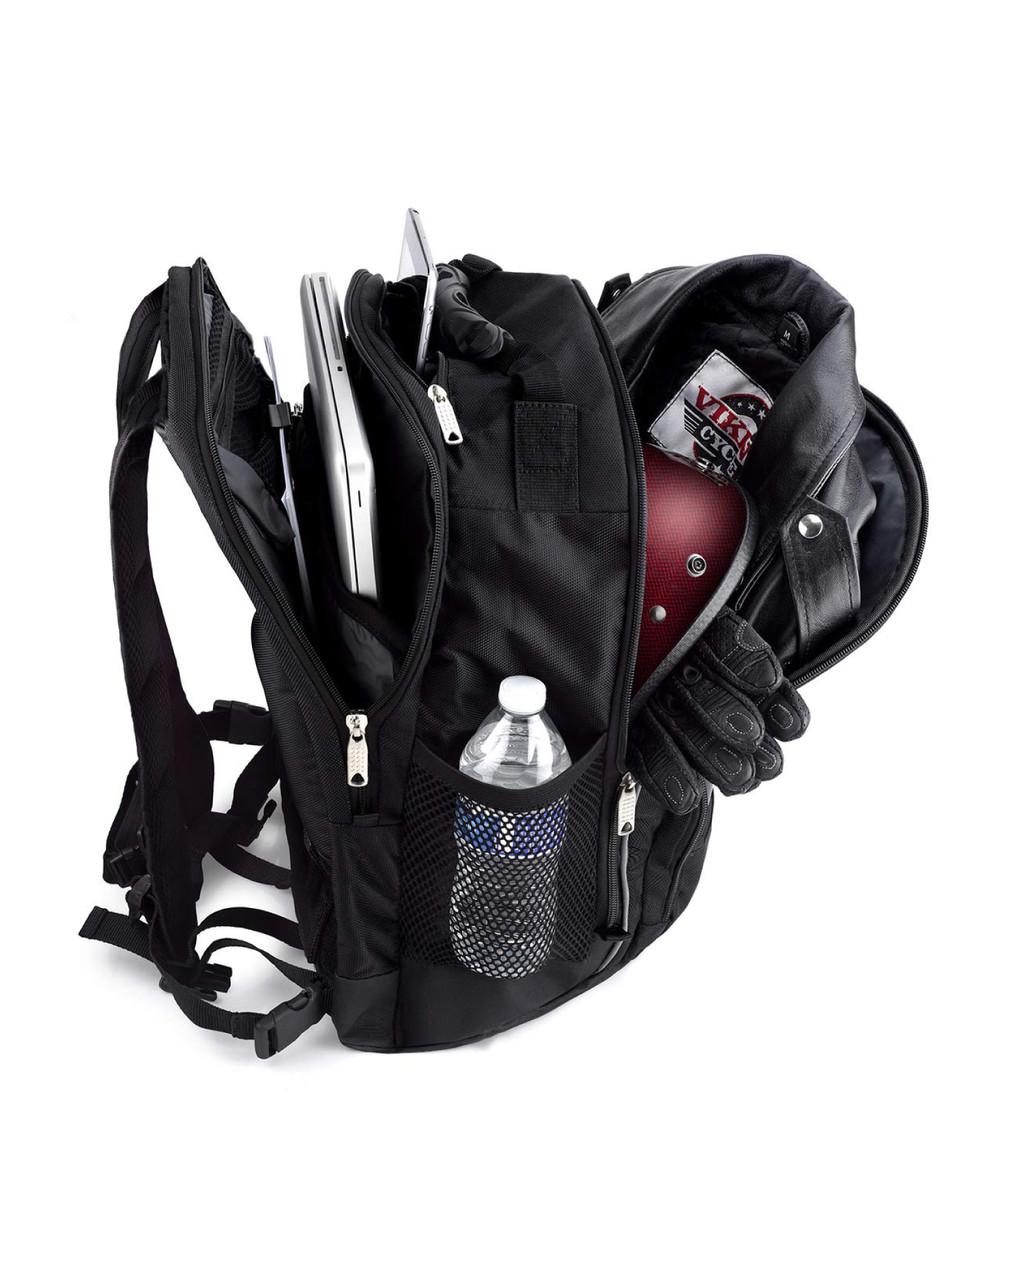 Suzuki Viking Motorcycle Sissy Bar Backpack Carrying Items View